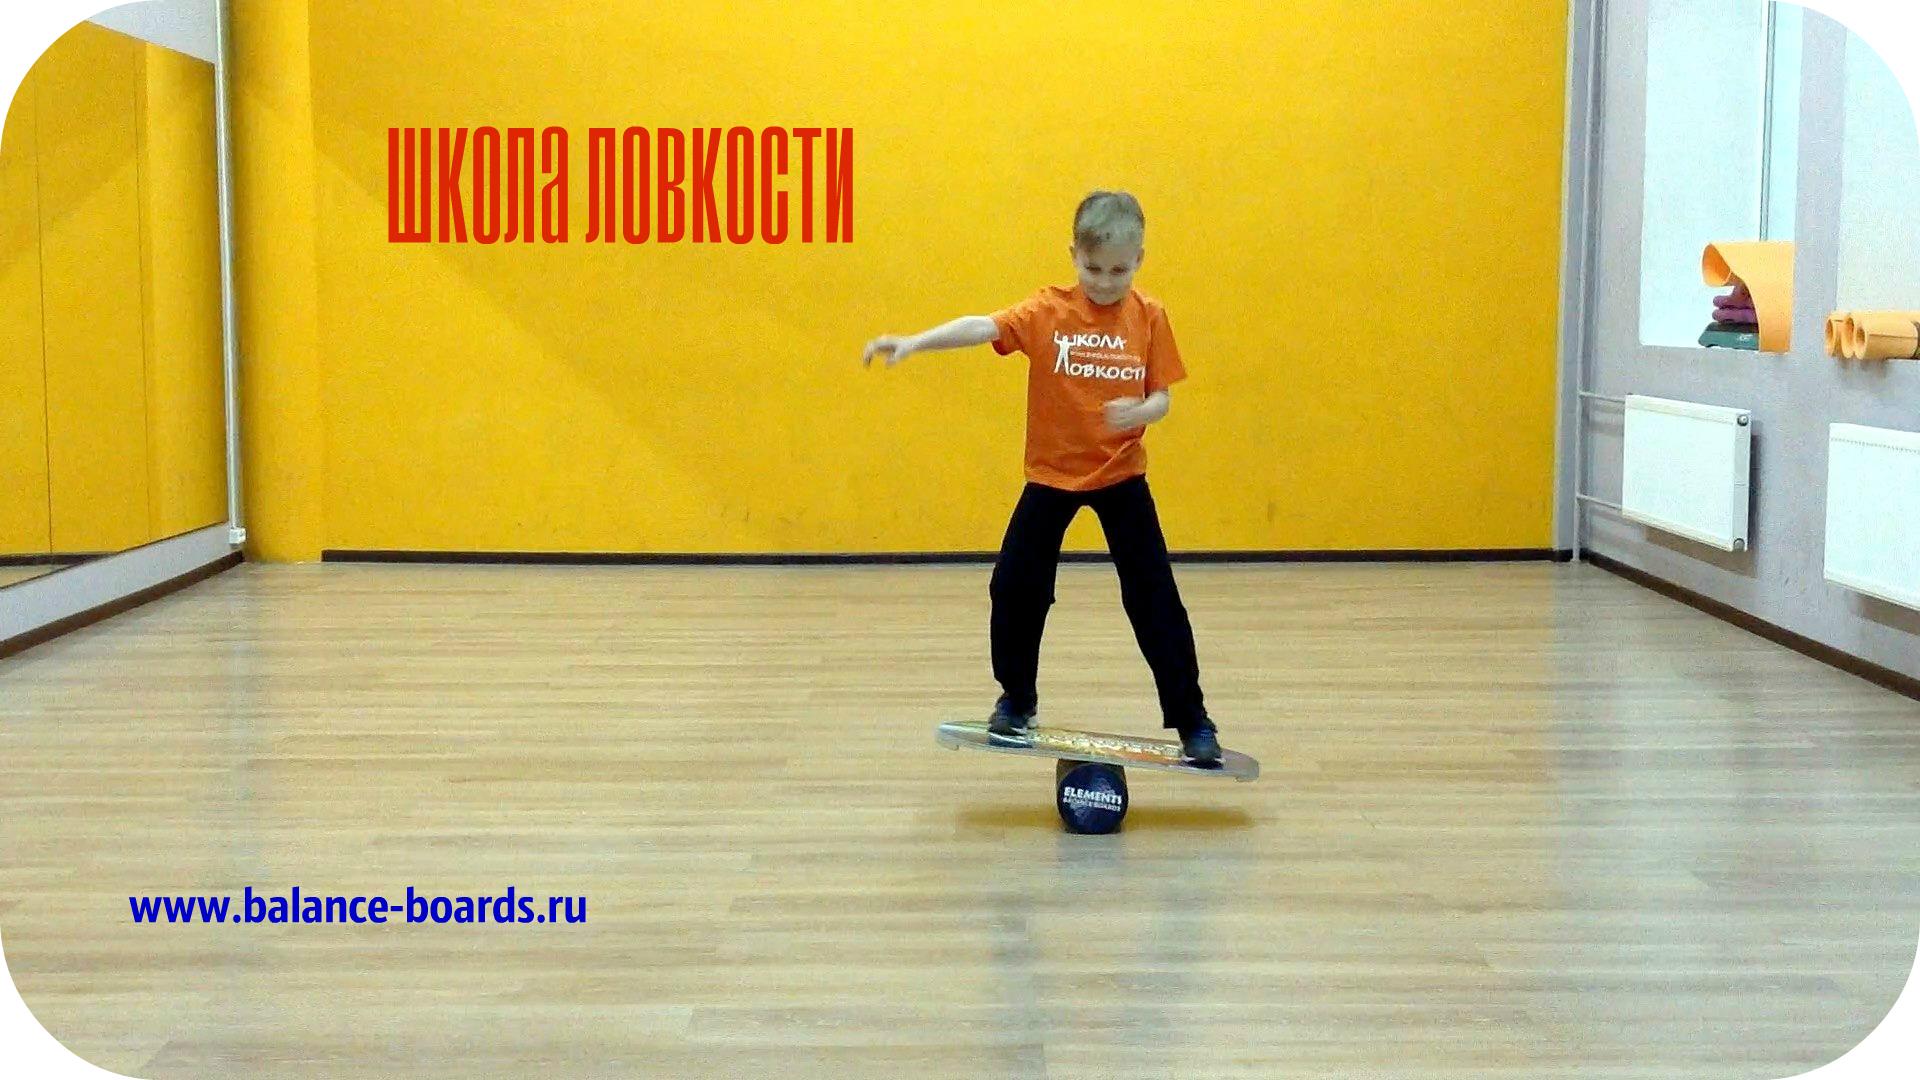 http://balance-boards.ru/images/upload/Поставьте%20ребенка%20на%20баланс%20борд.jpg